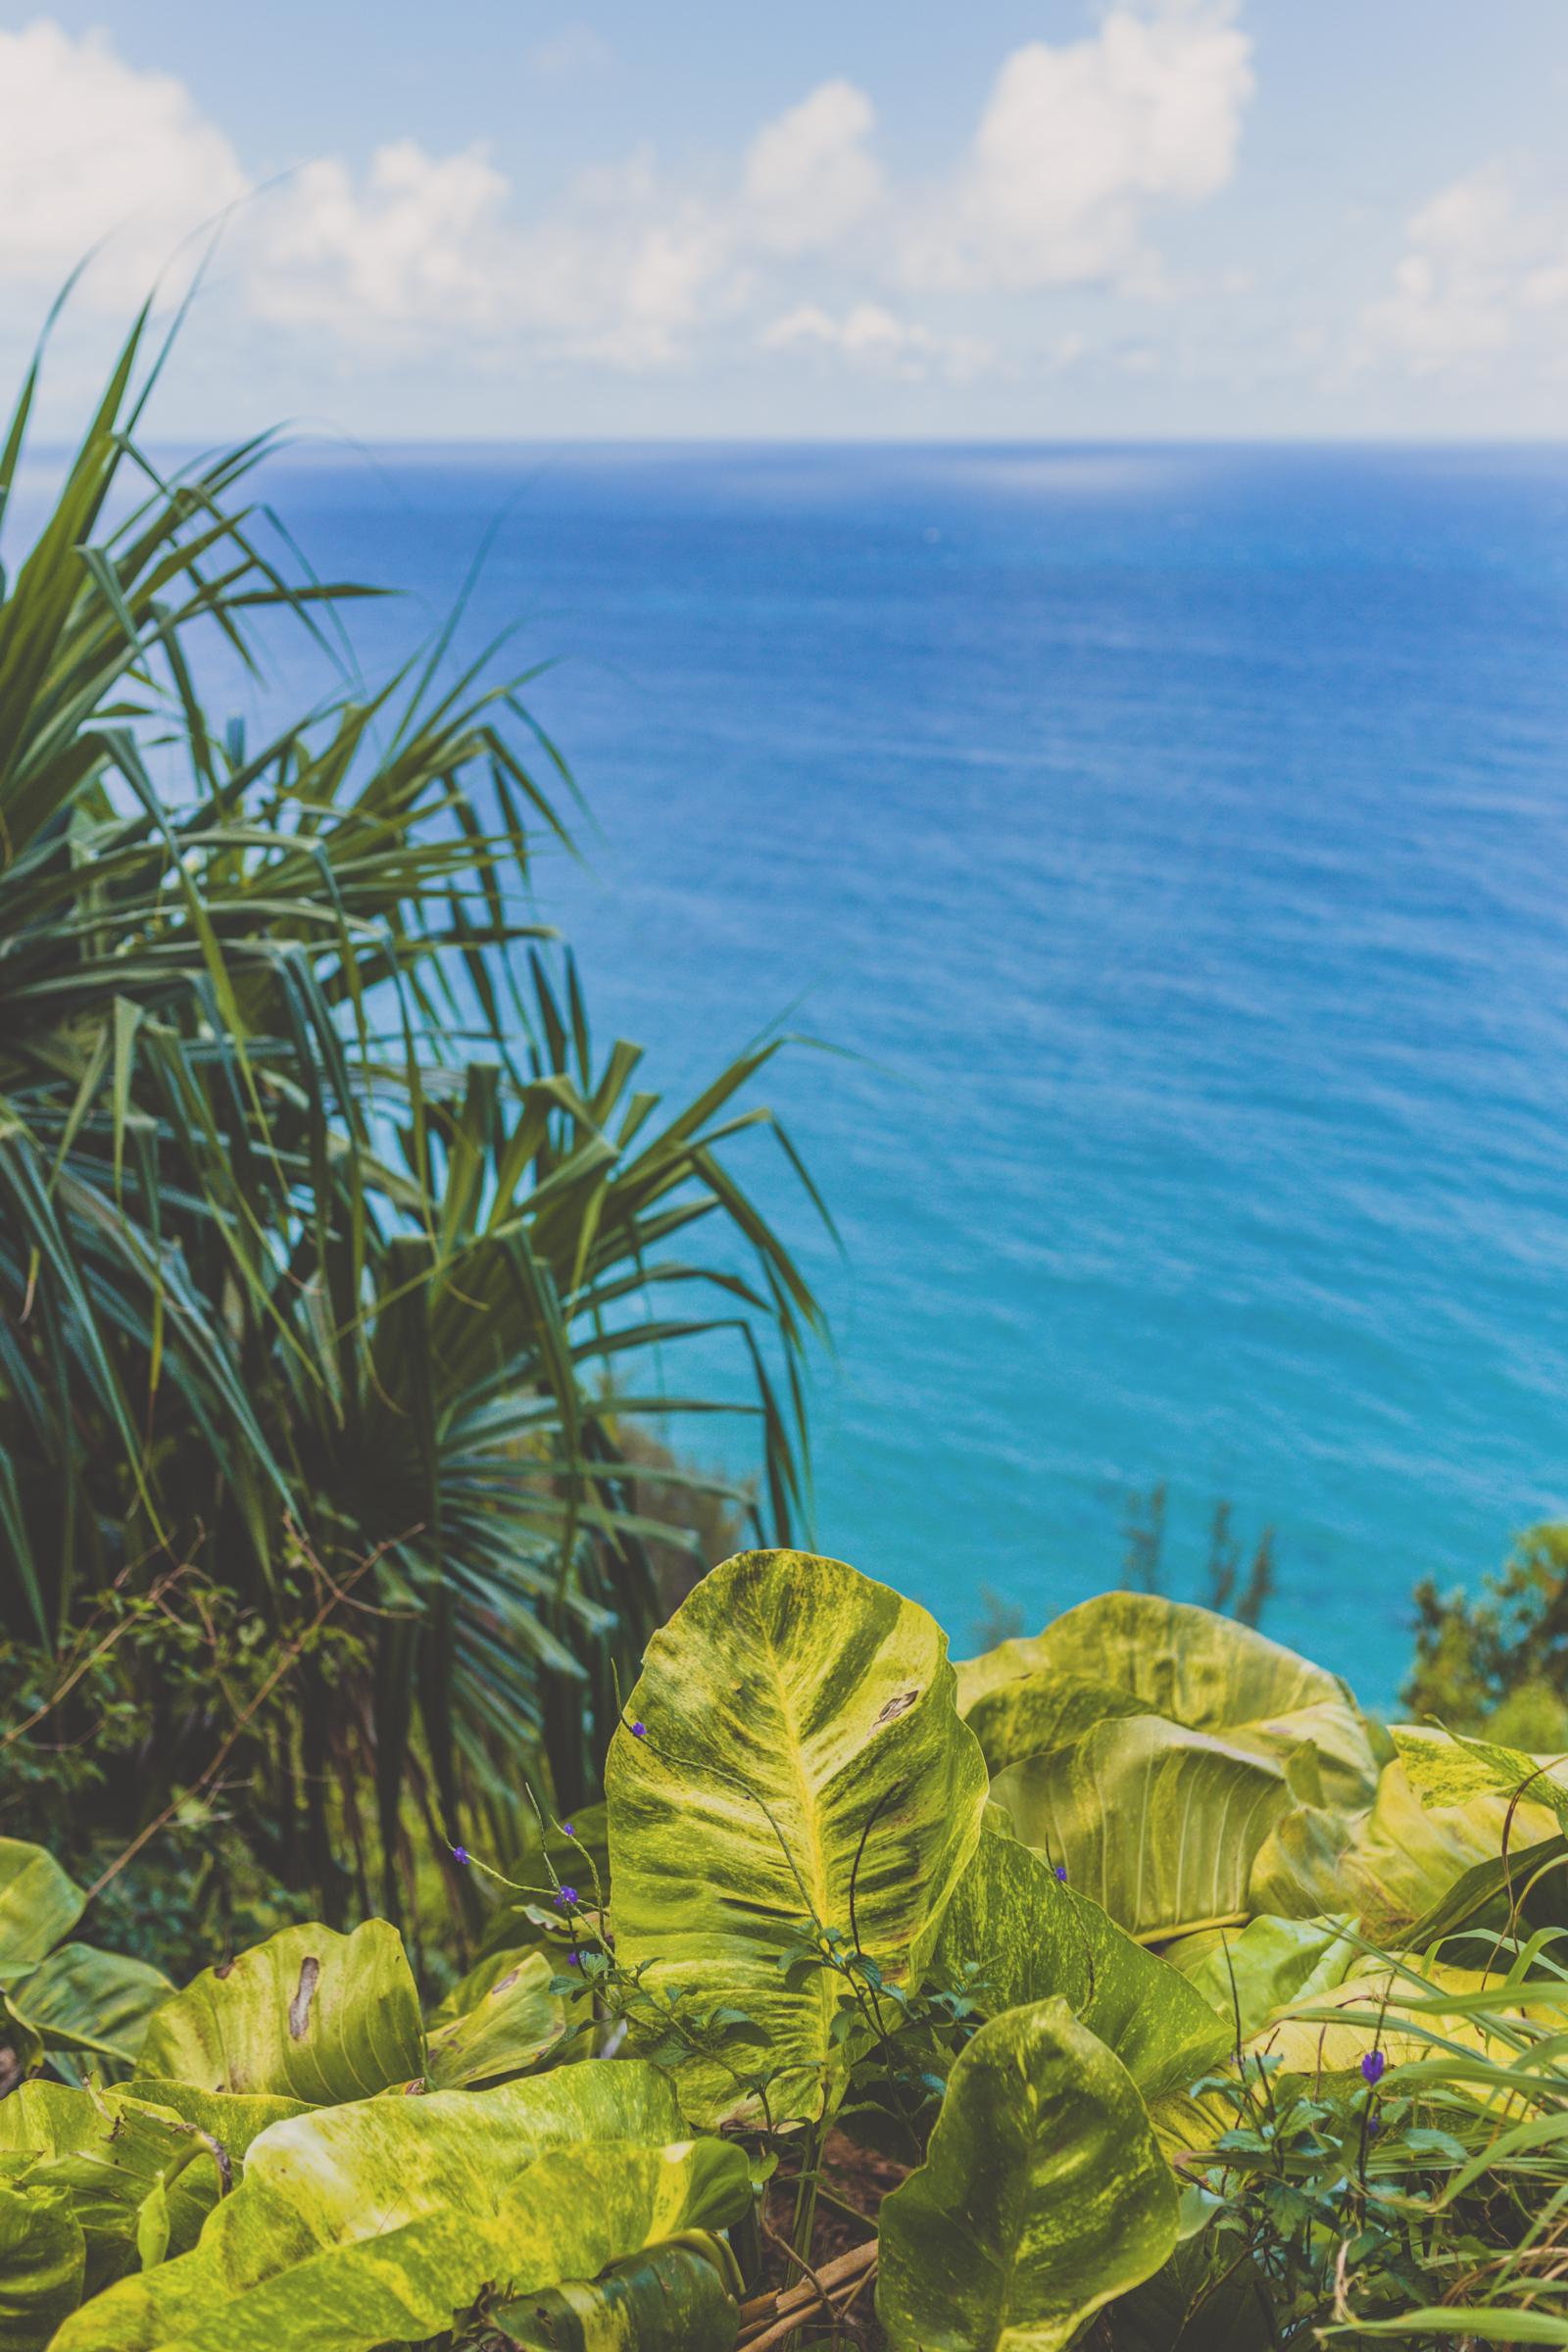 IMG_2566--KAUAI-HAWAII-JENNIFER-PICARD-PHOTOGRAPHY.jpg